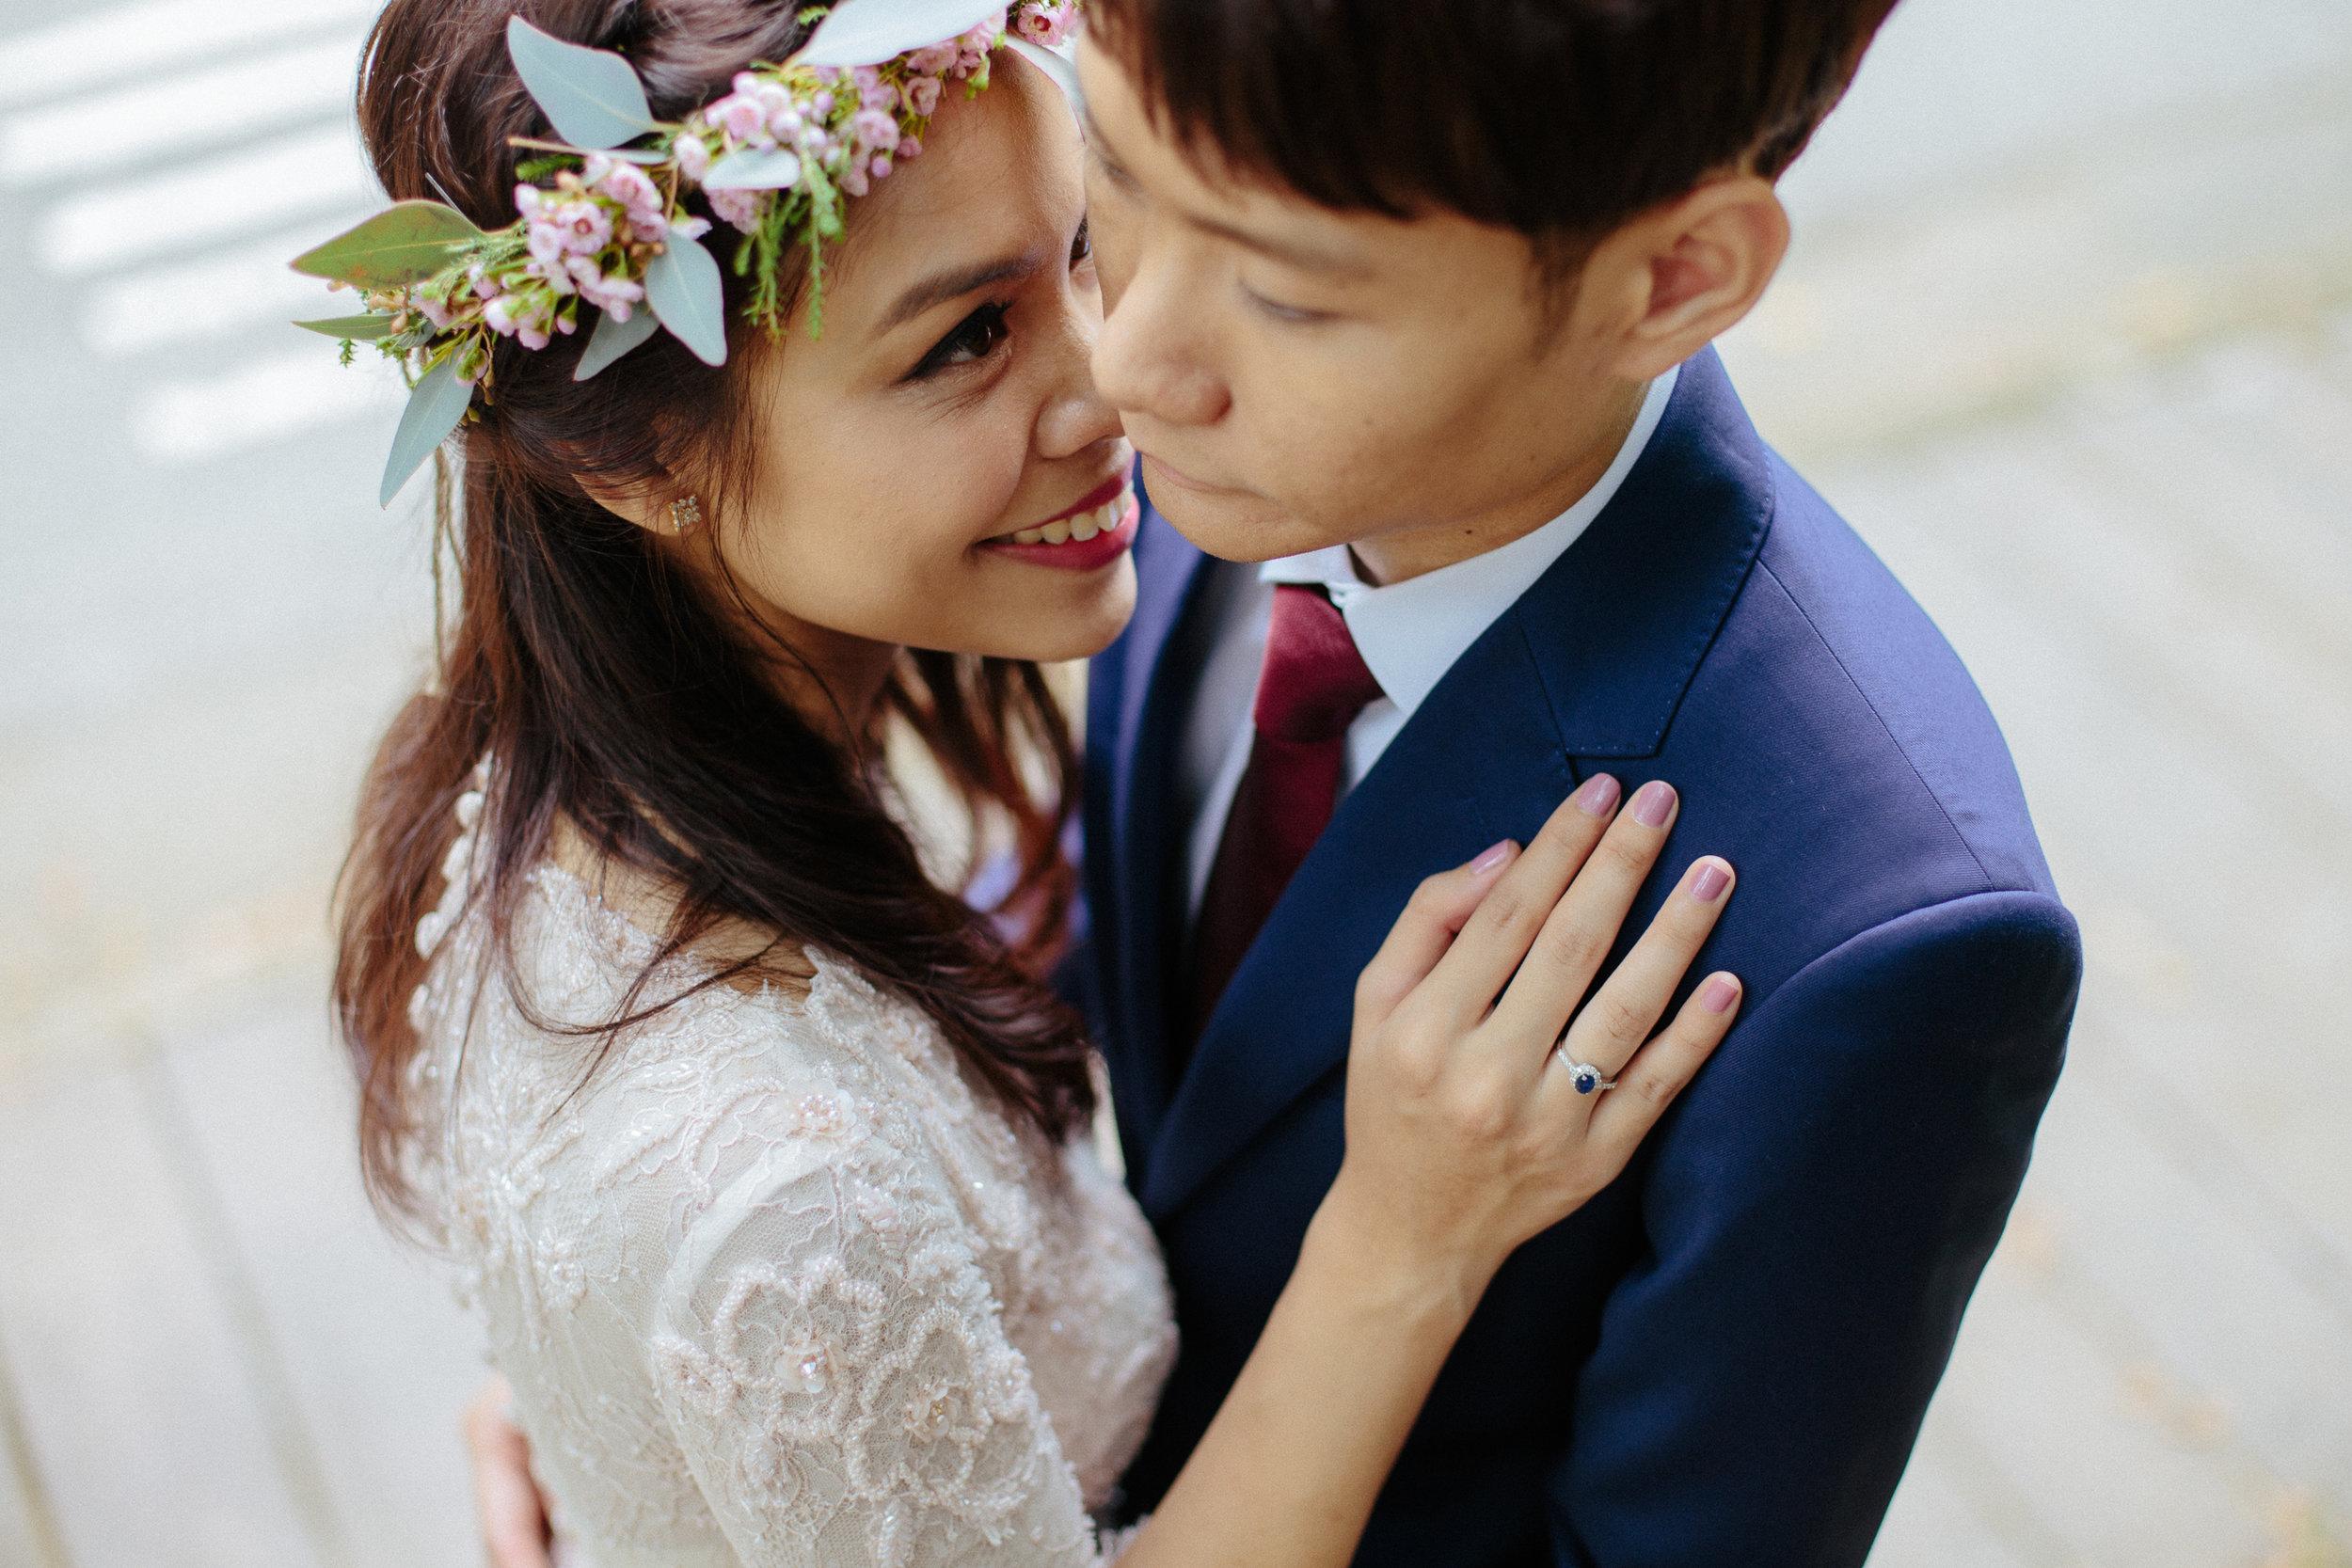 singapore-wedding-photographer-fadilah-kwan-074.jpg